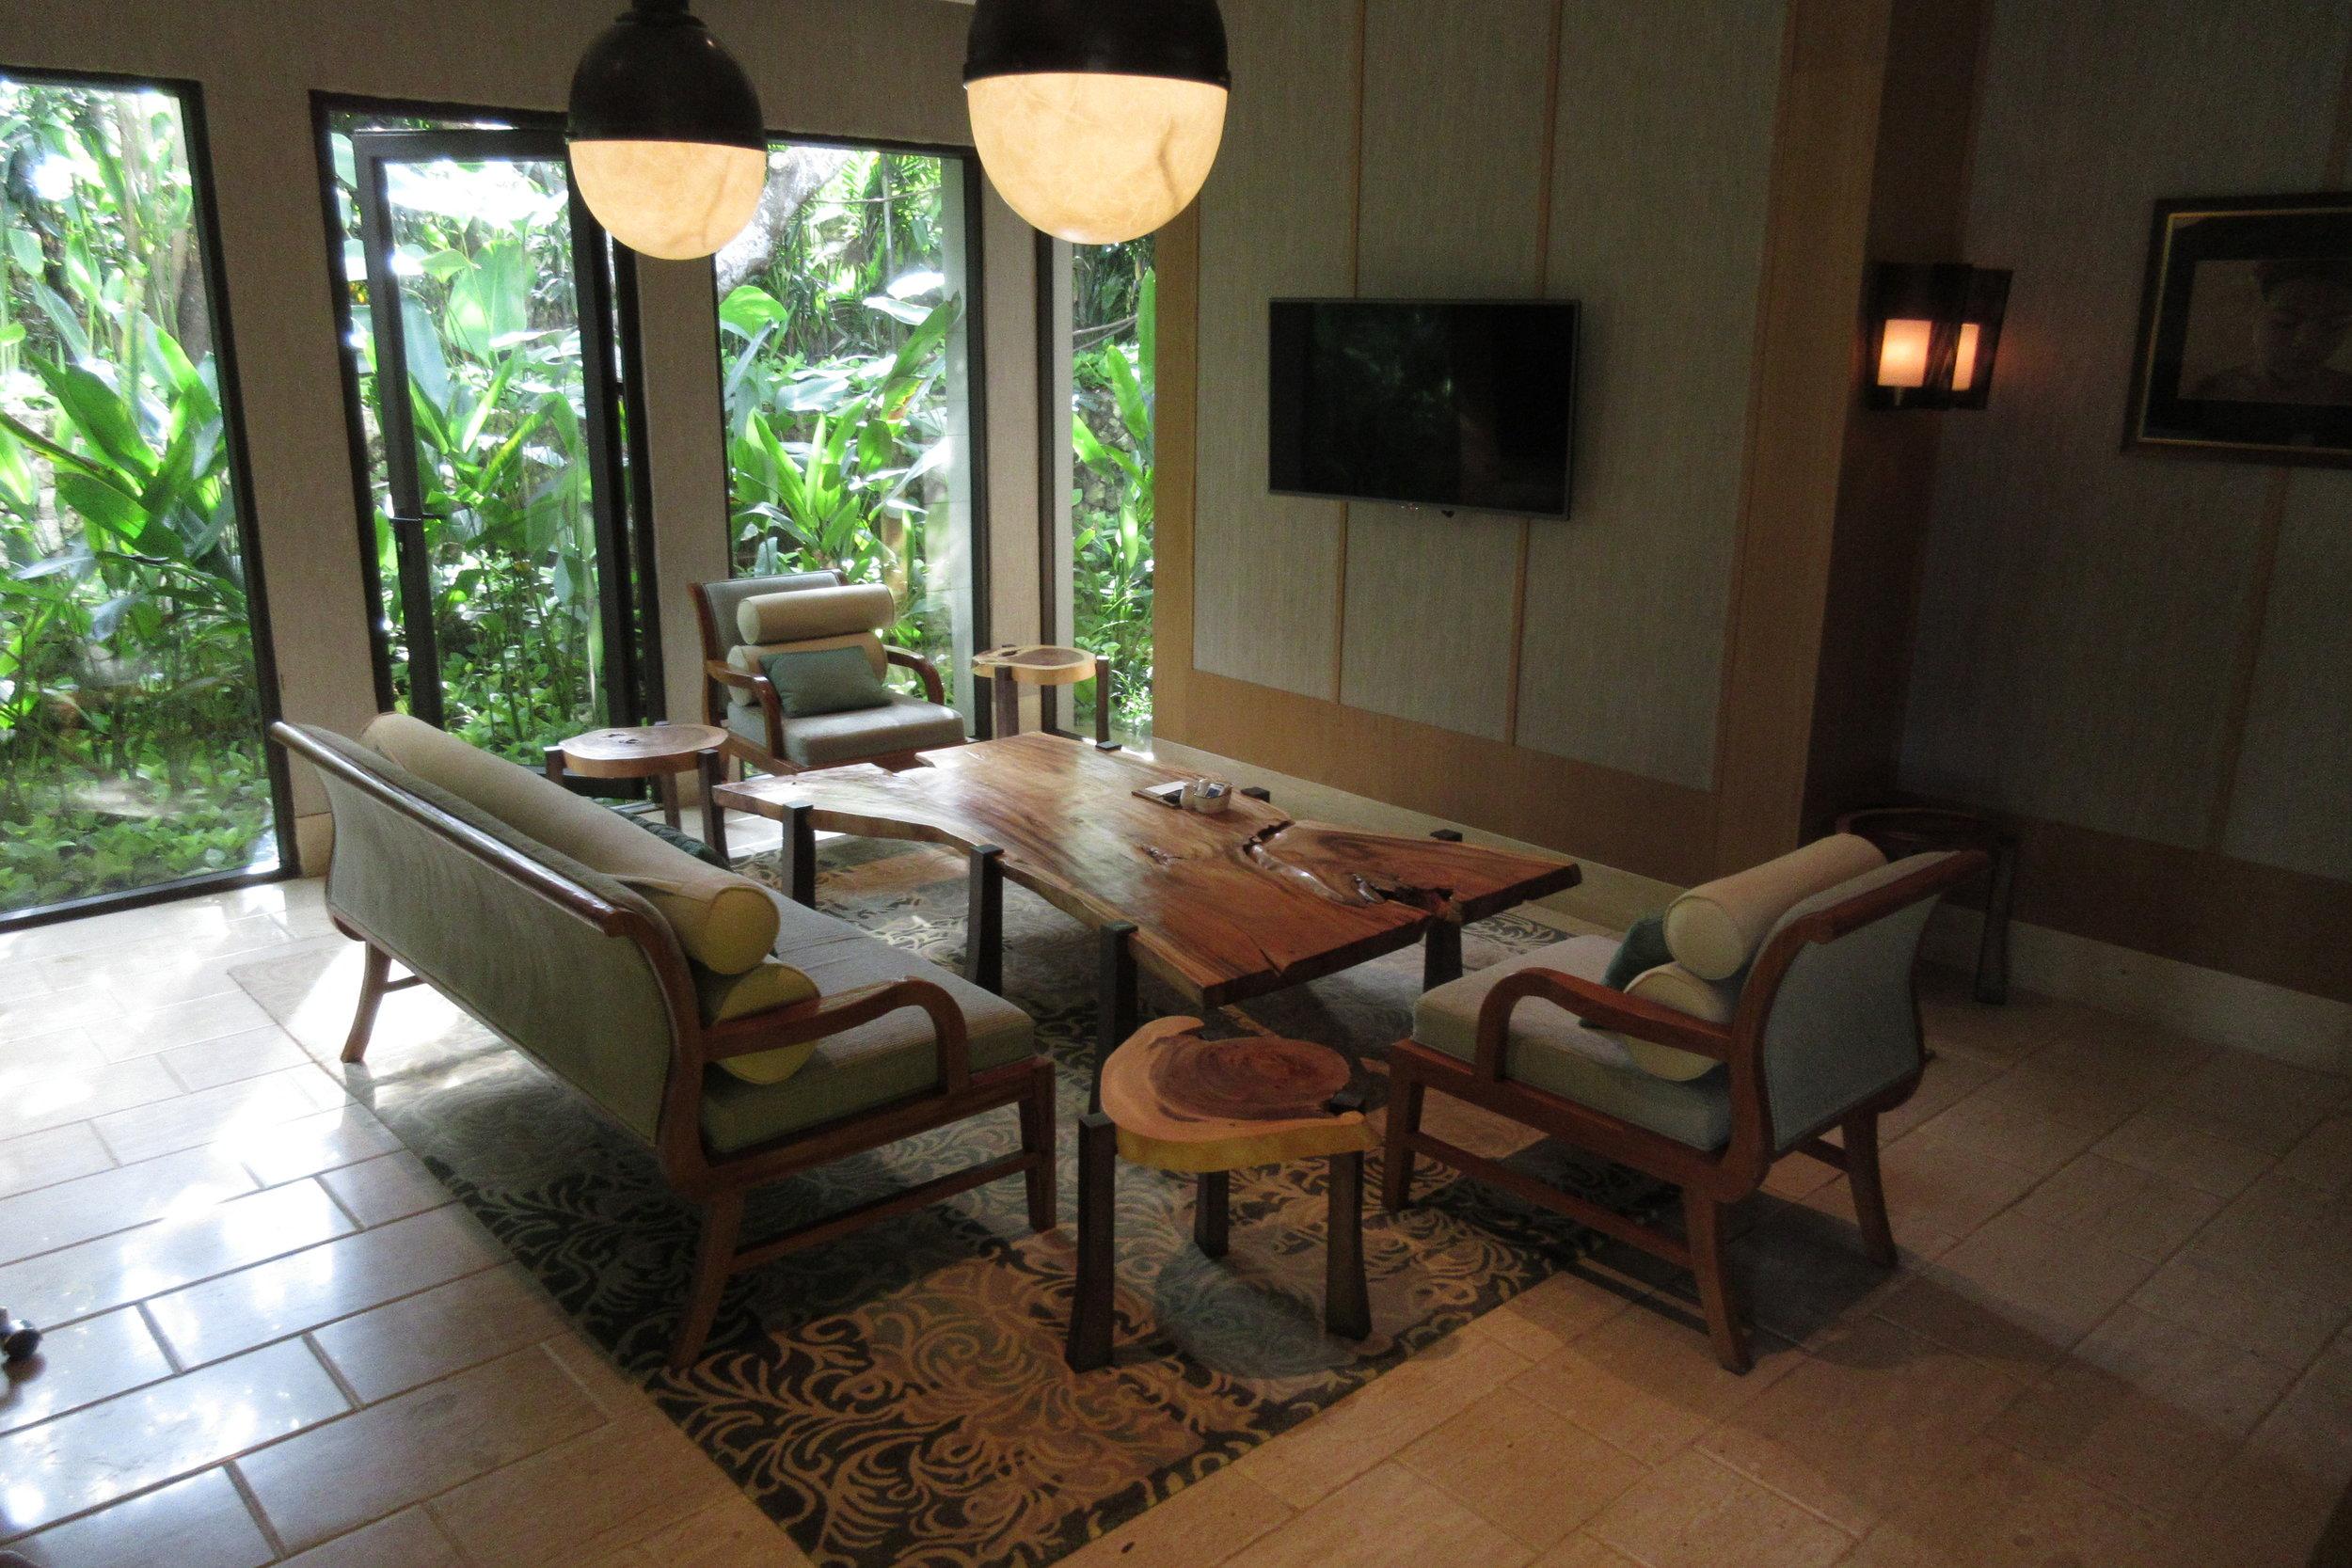 The Ritz-Carlton, Bali – Club interior